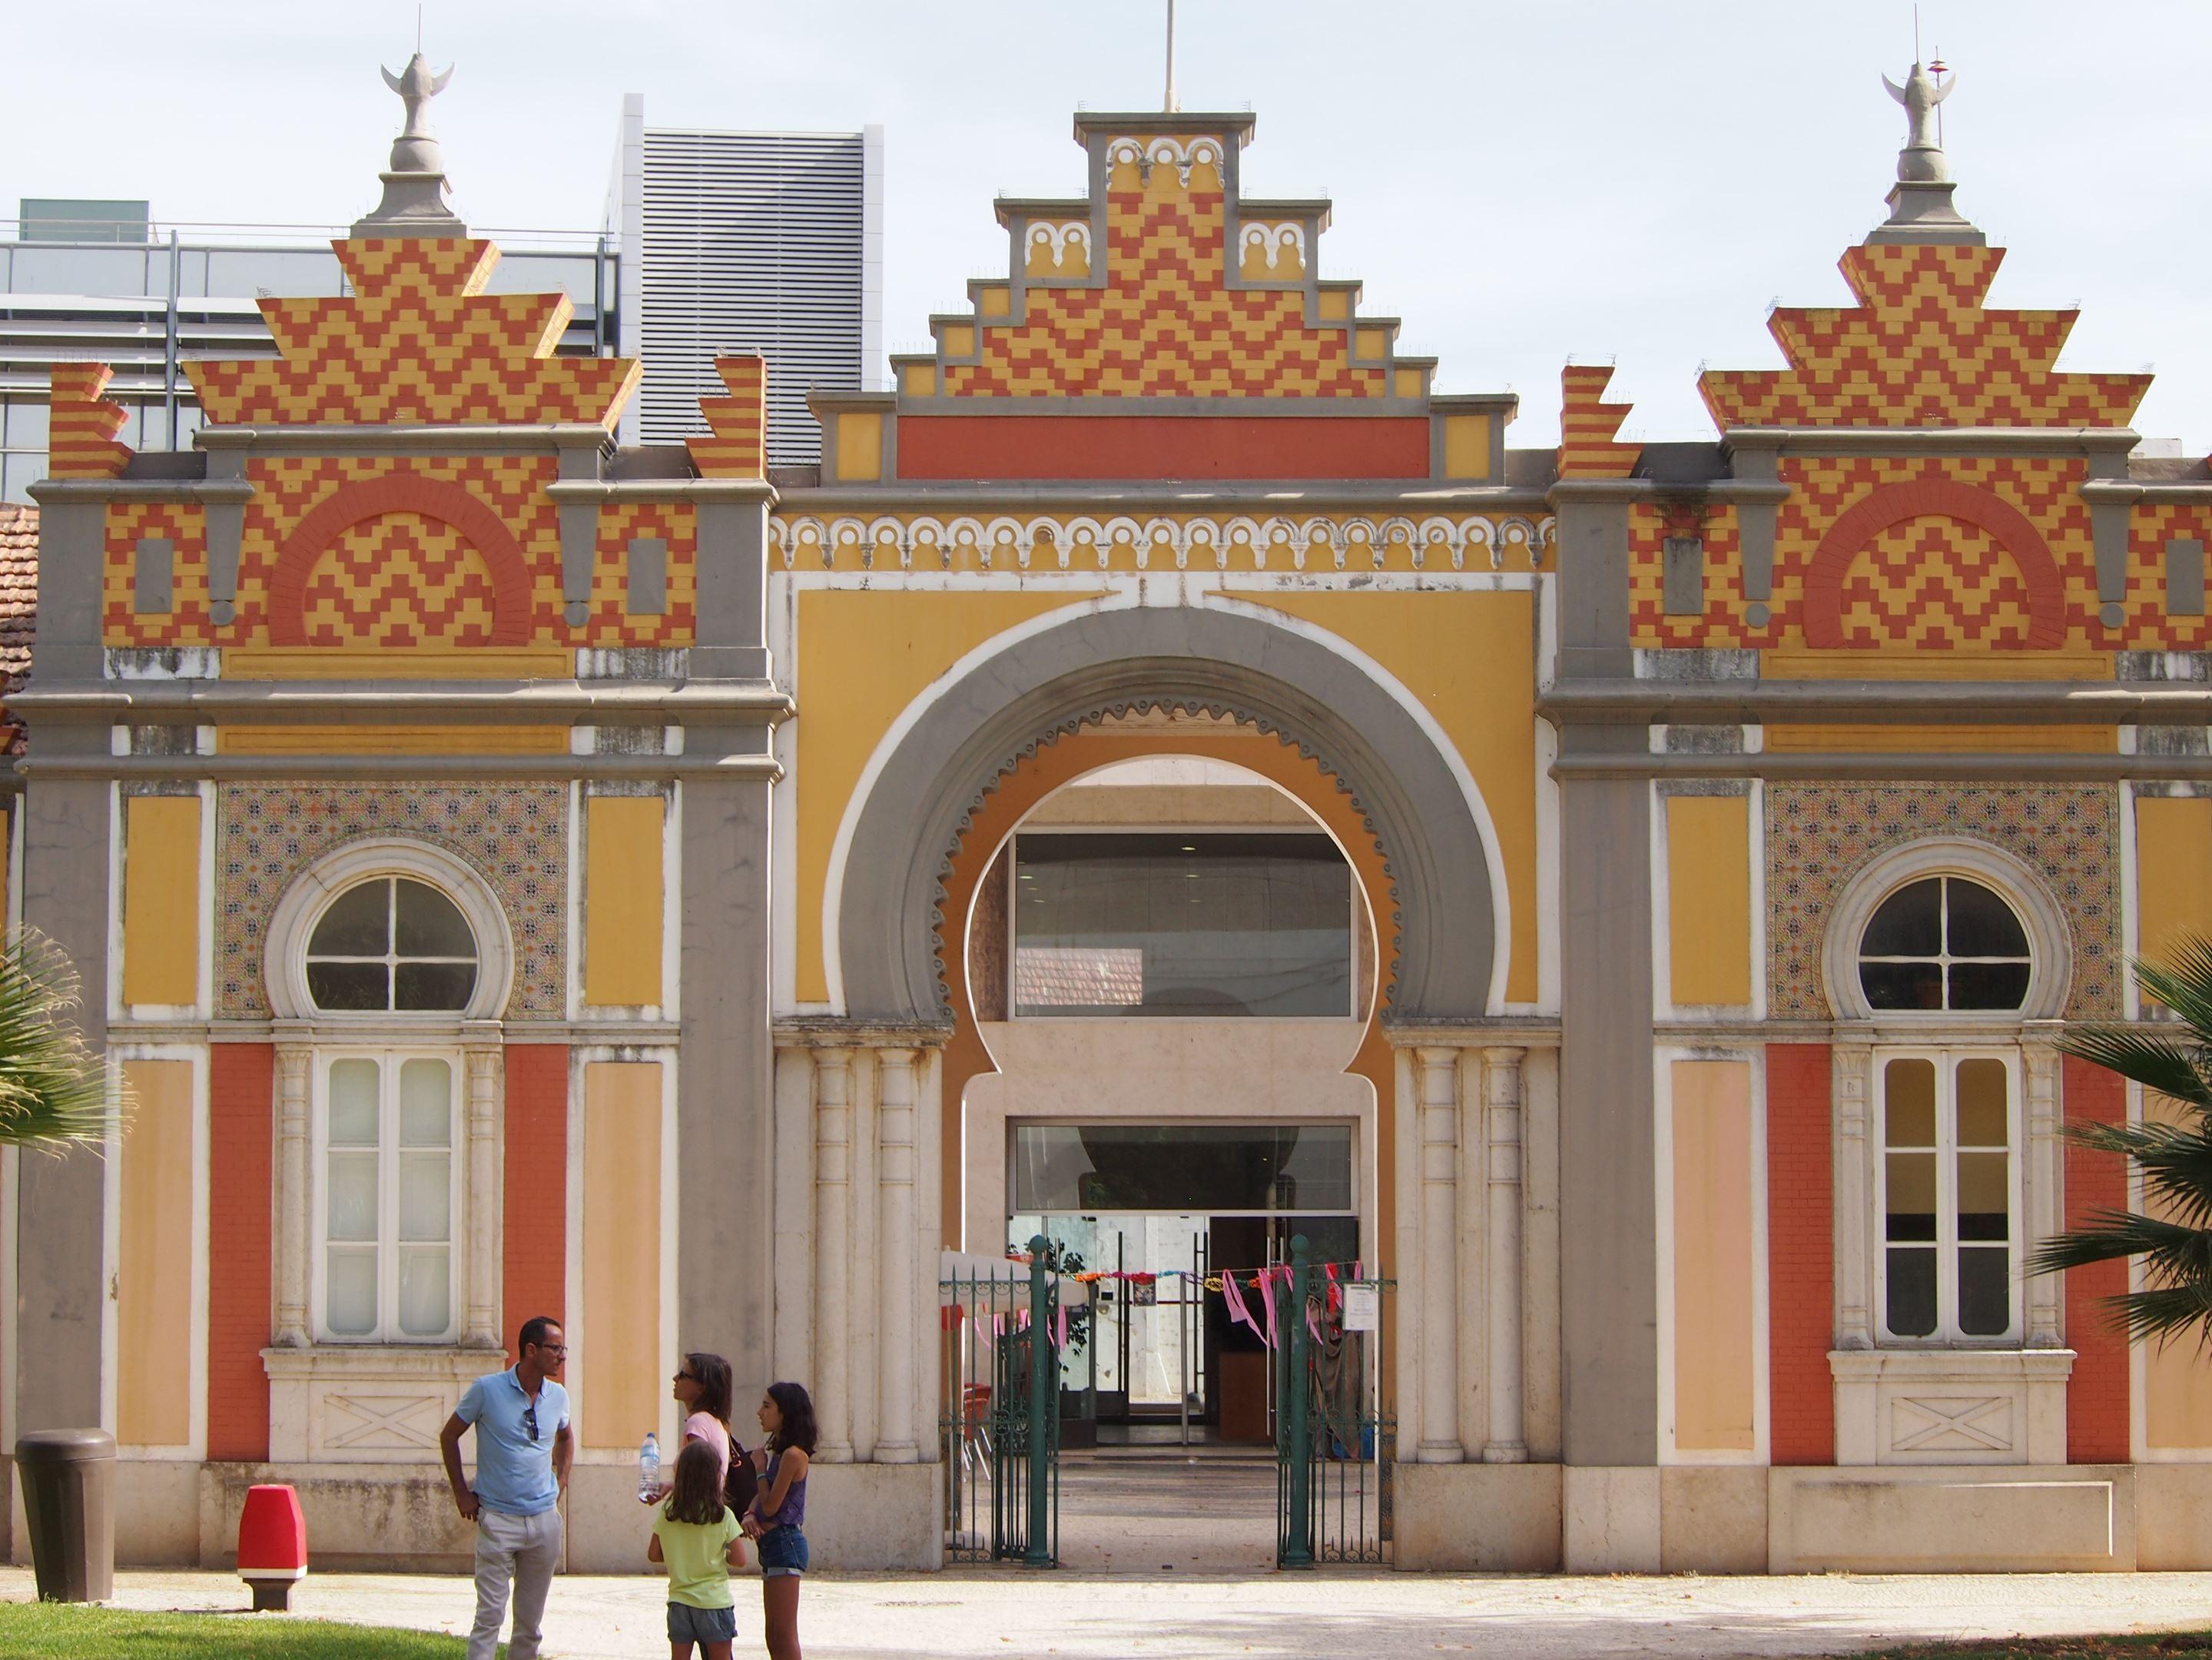 Arab influenced architecture in Jardim da Alameda João de Deus, Faro